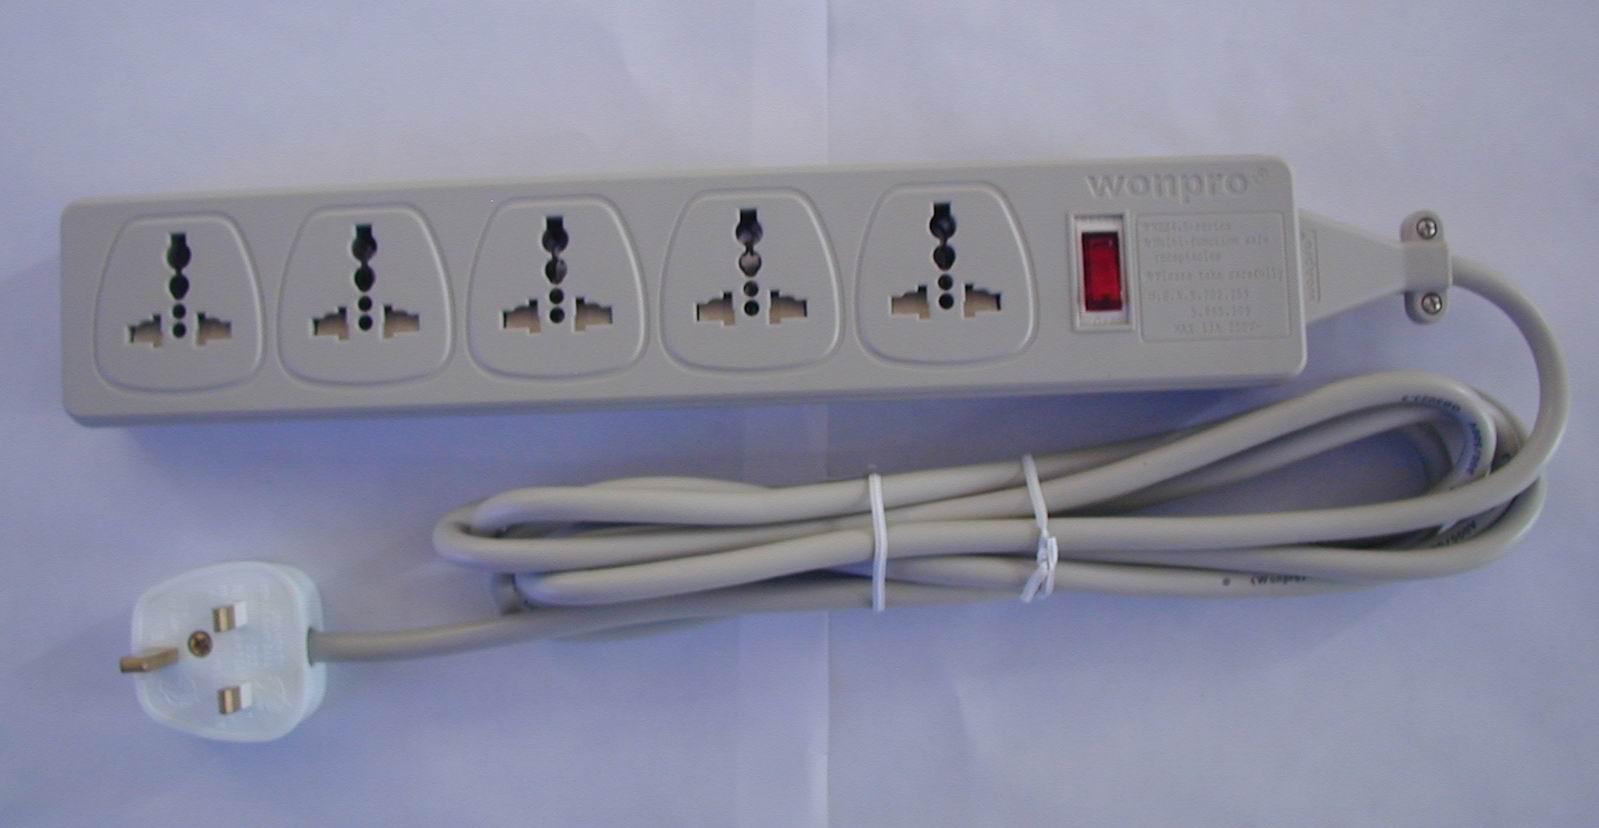 universal outlet power strip w uk cable. Black Bedroom Furniture Sets. Home Design Ideas